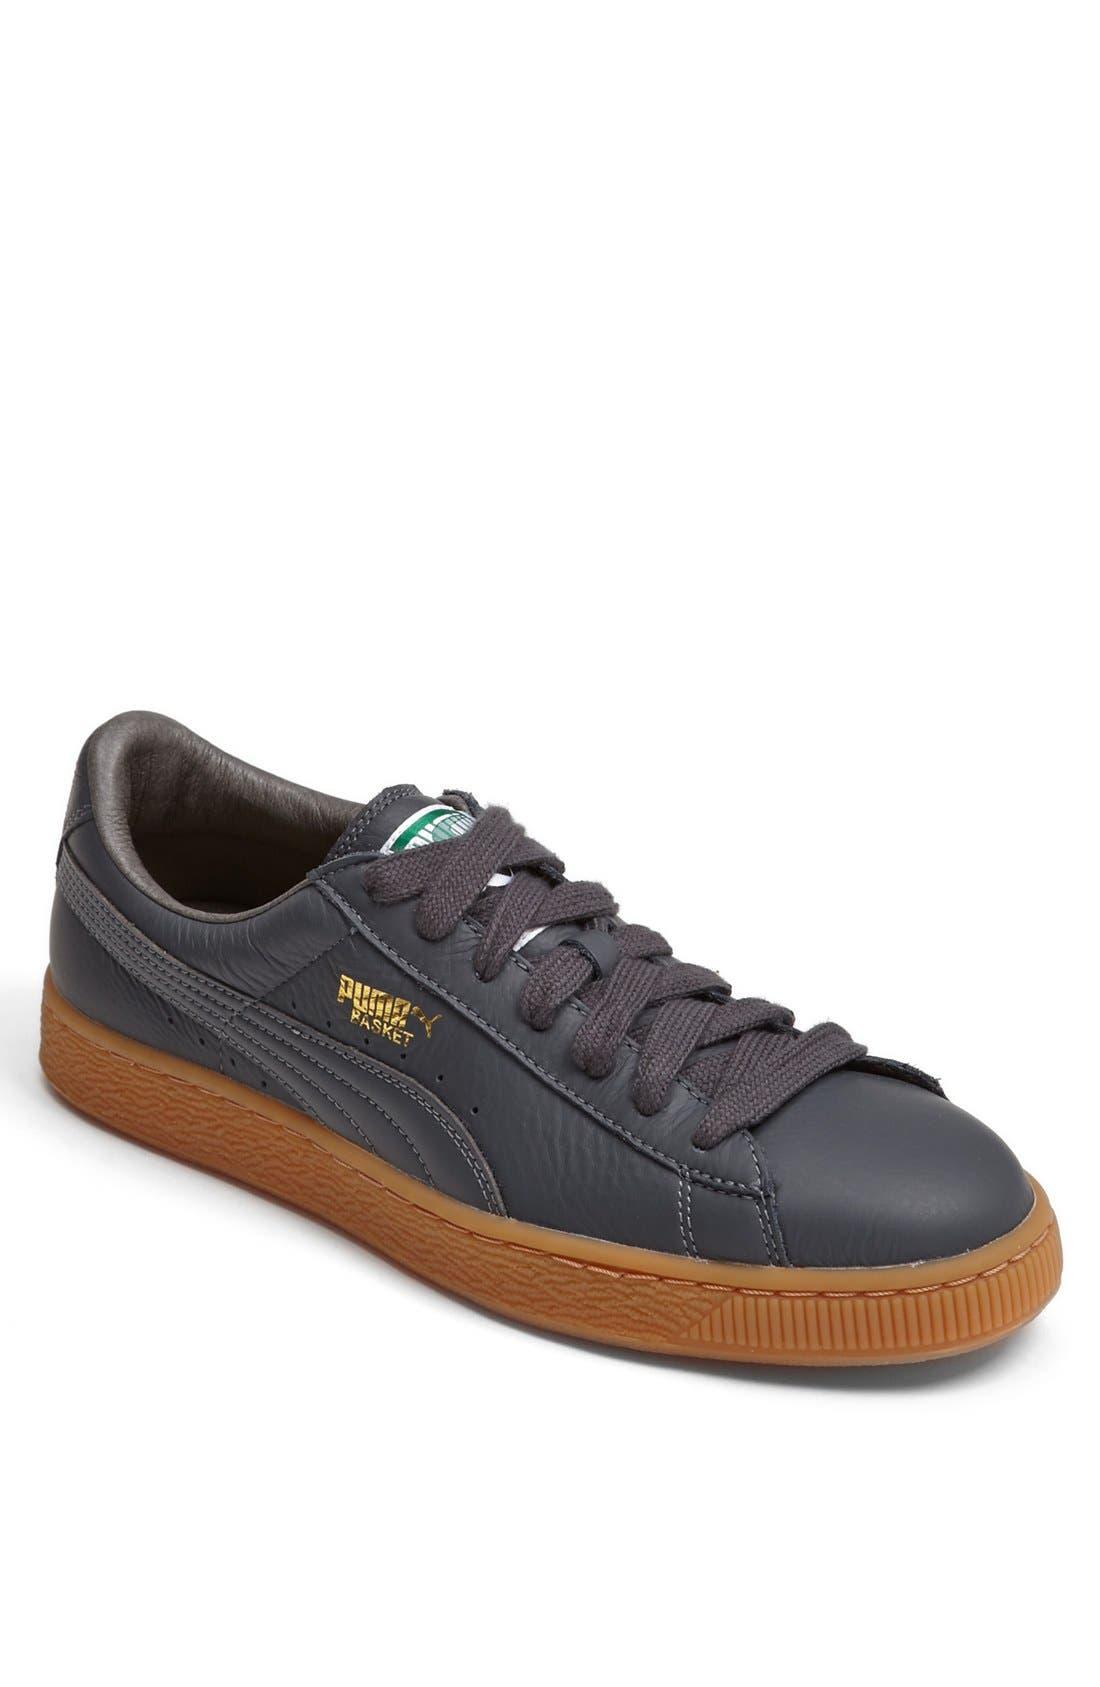 'Basket Classic' Sneaker, Main, color, 060